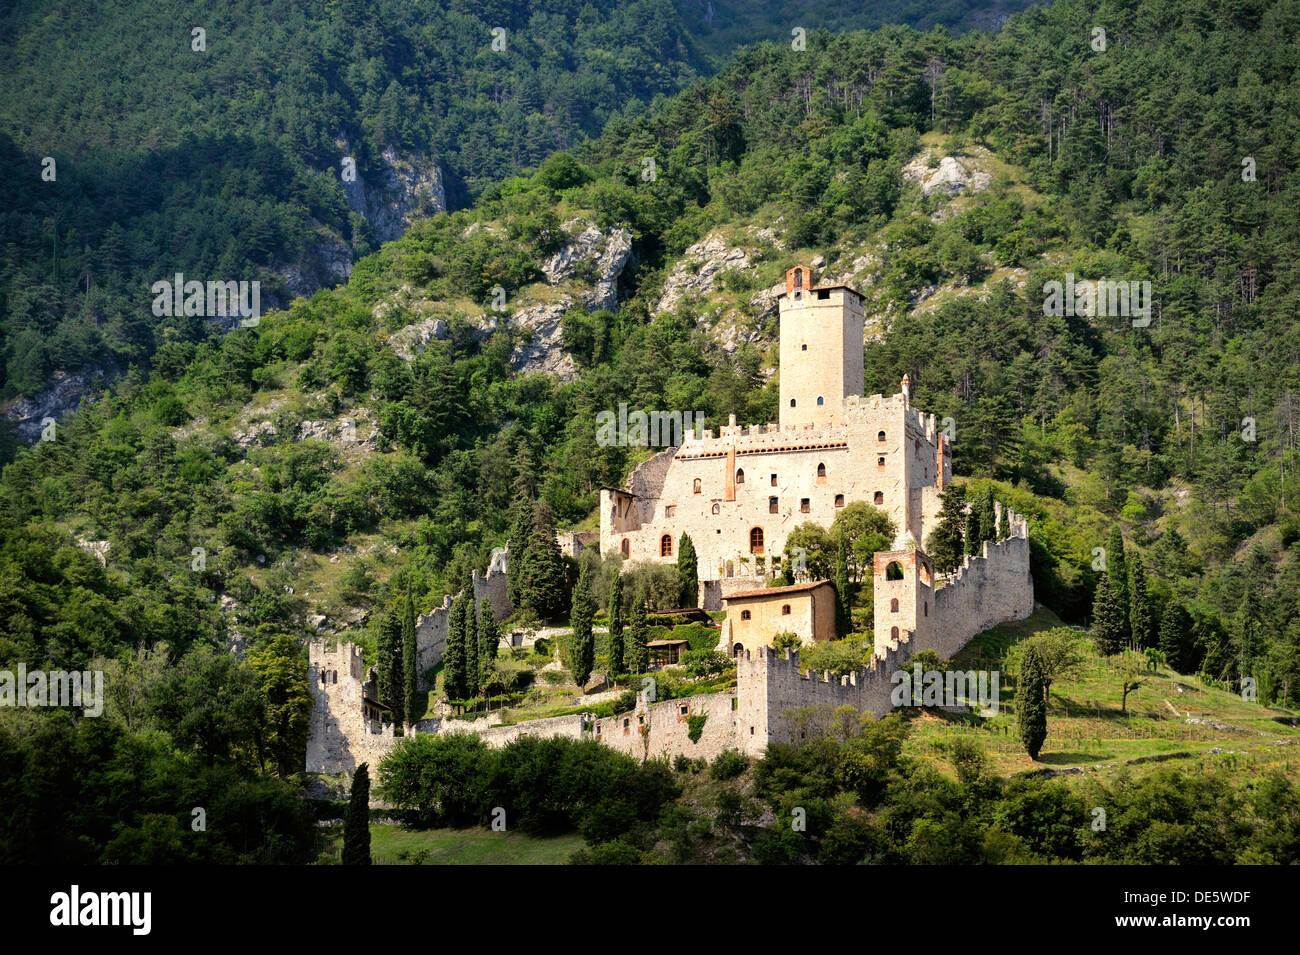 Castello di Sabbionara mediaeval castle at Avio in the Sud Tirol, Alto Adige, Trentino region of Italy - Stock Image